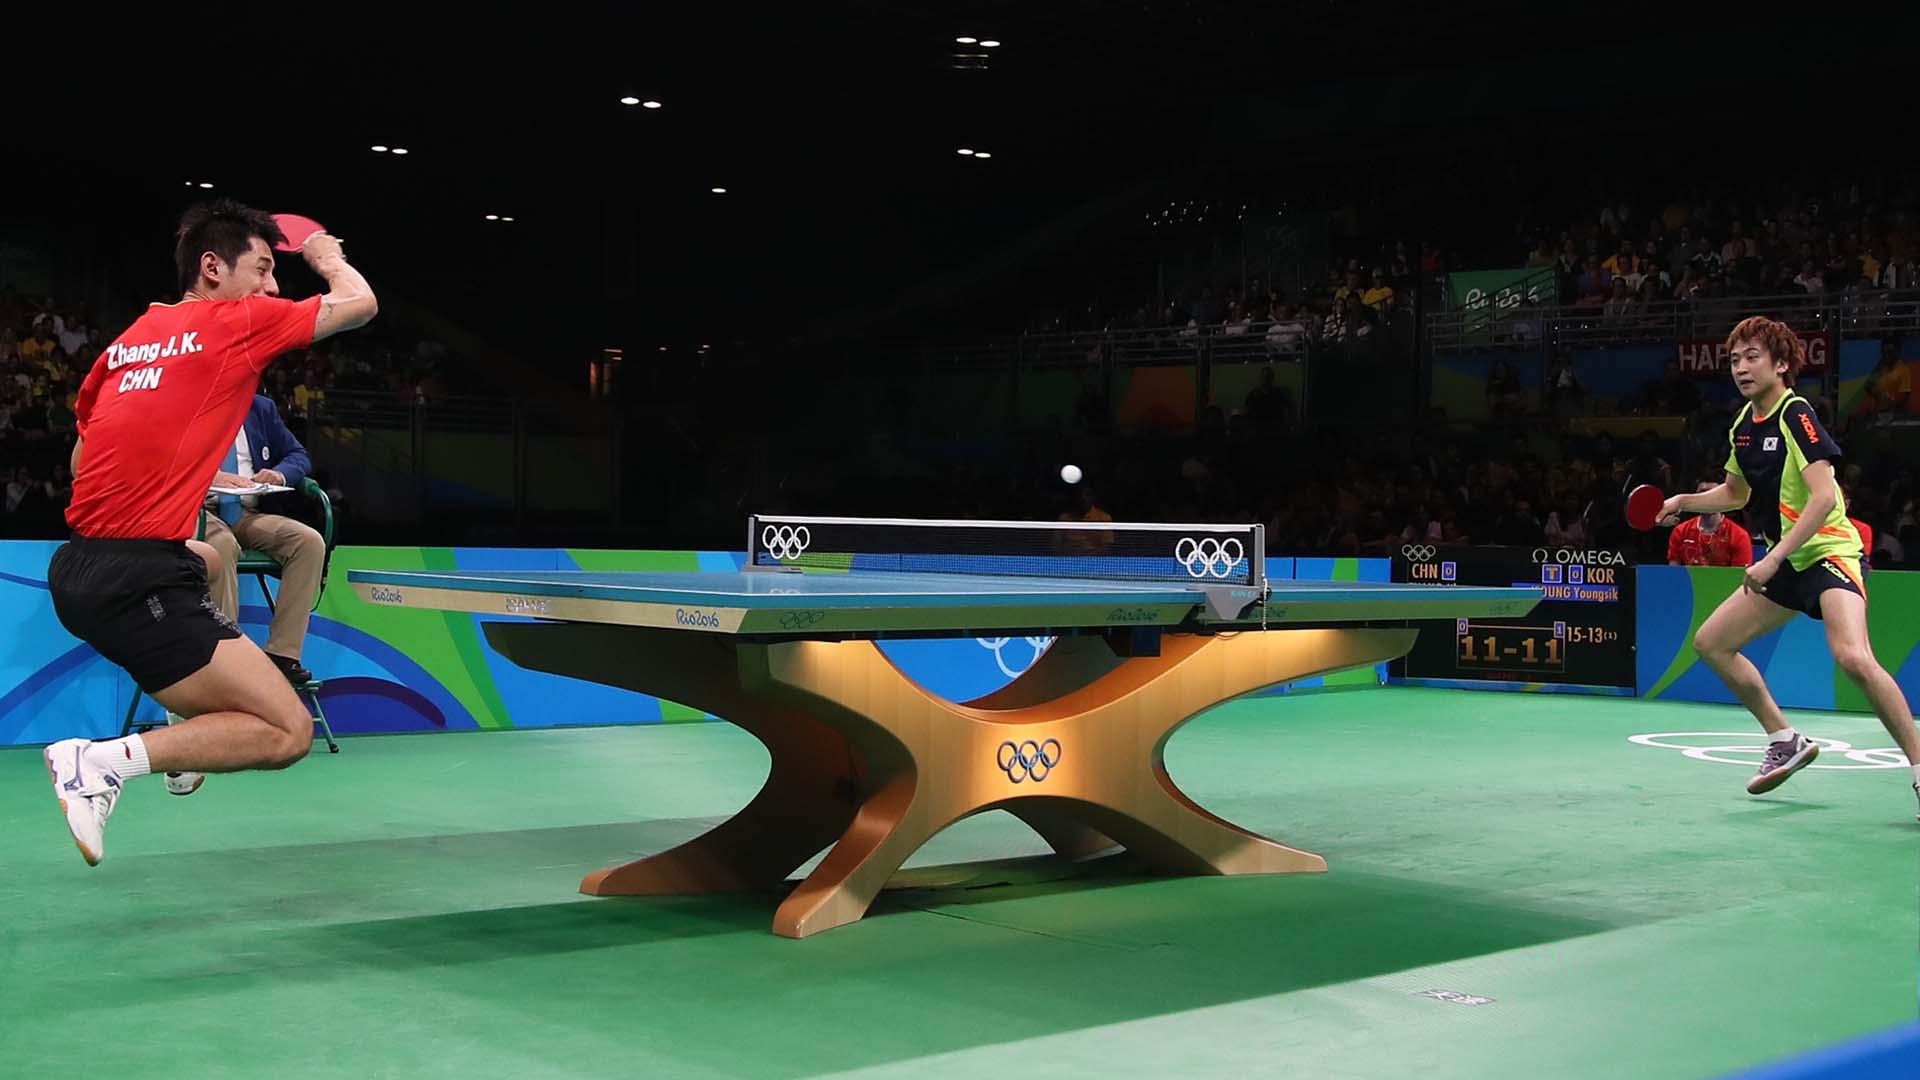 olympic_04_01_17.jpg